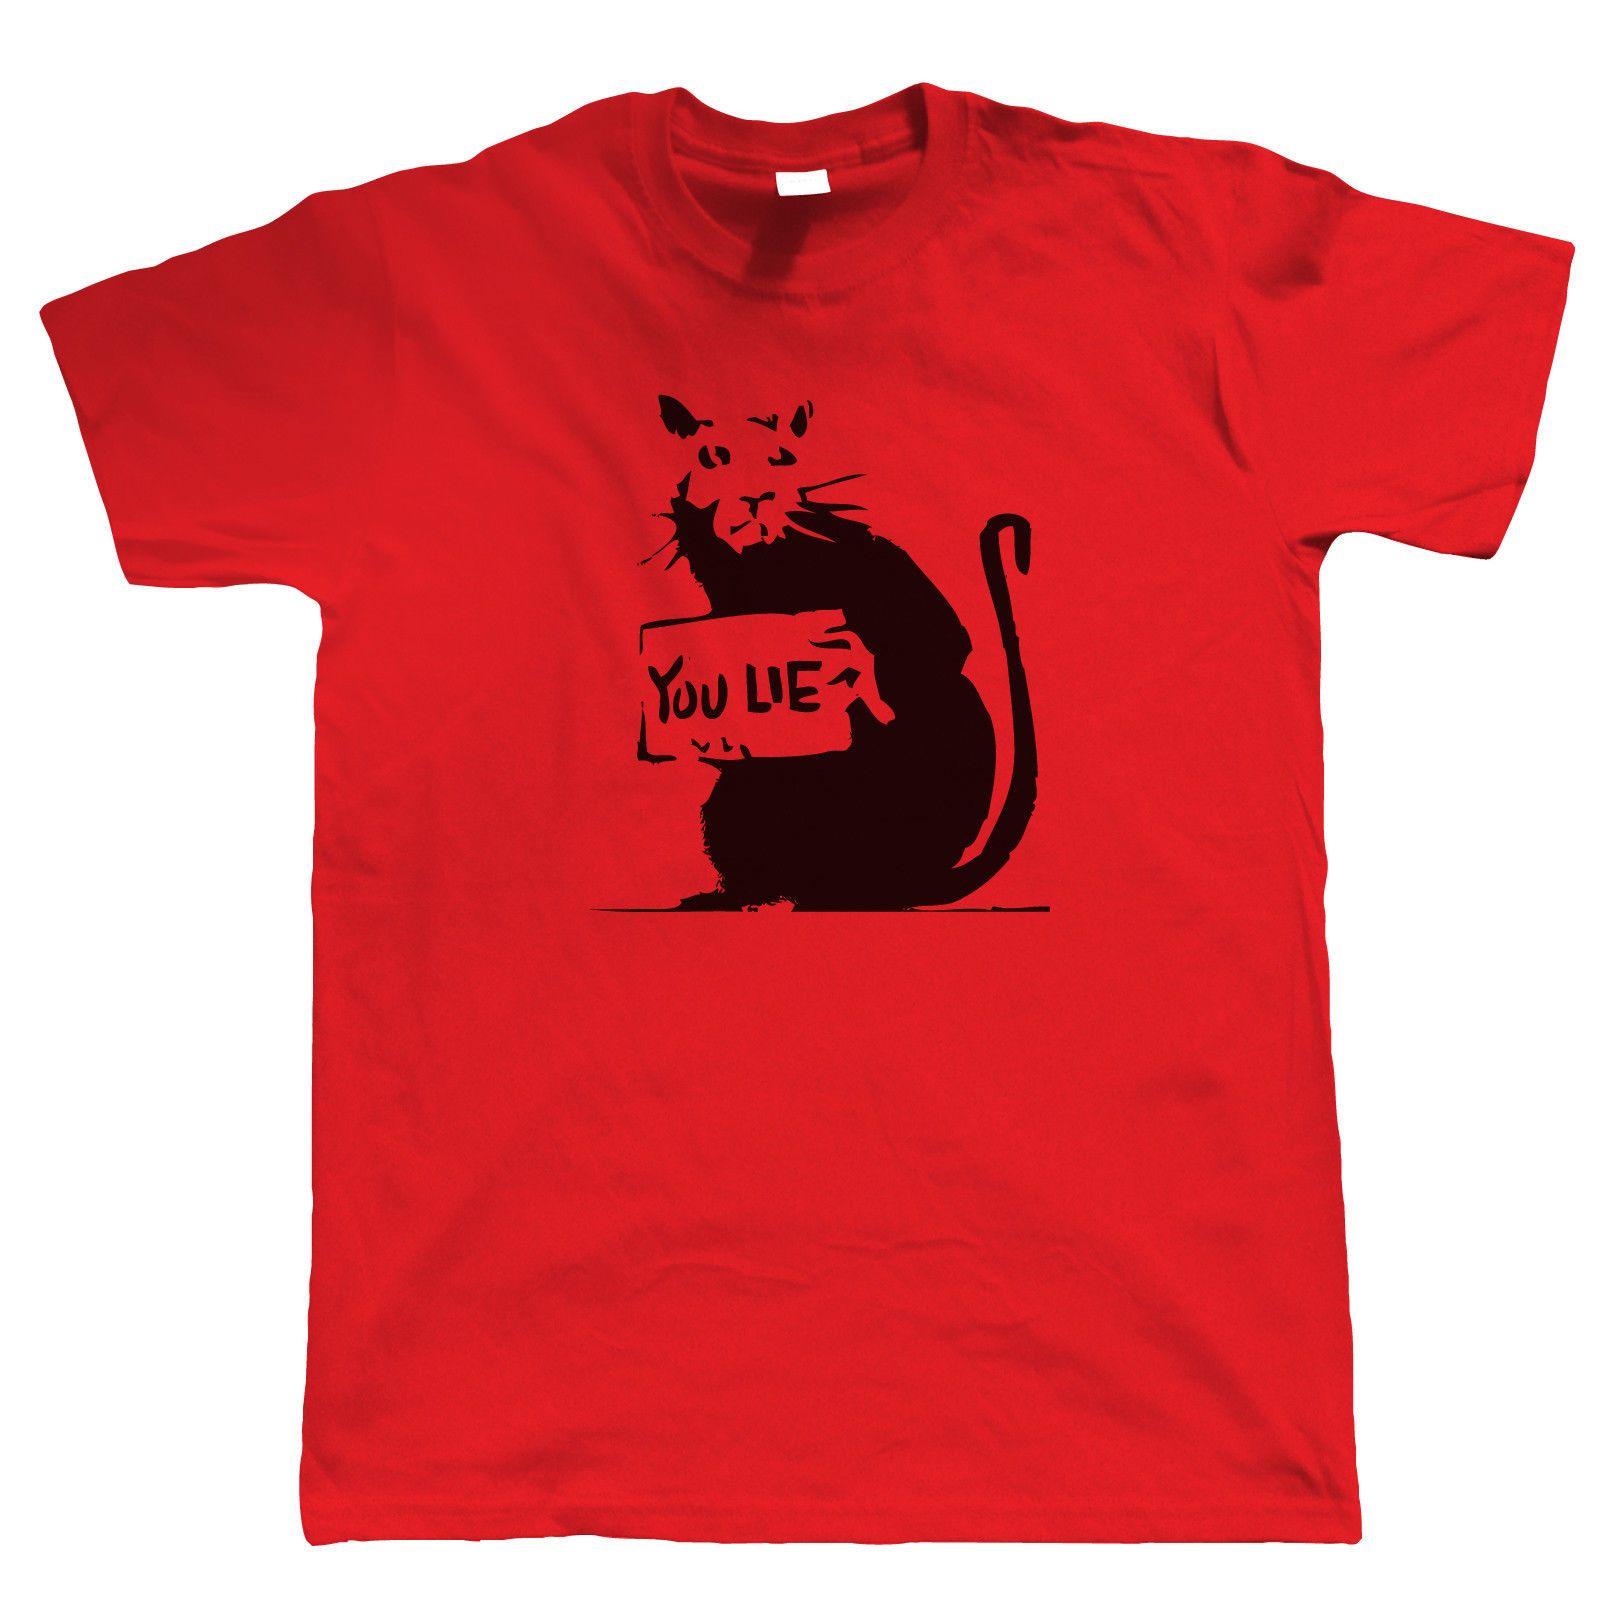 1e6276e19393 Banksy Rat You Lie T Shirt Graffiti Urban Art Political Offensive Mens 2018  Fashion Brand T Shirt O Neck 100%cotton T Shirt Tops Tee Awesome Shirt  Design ...